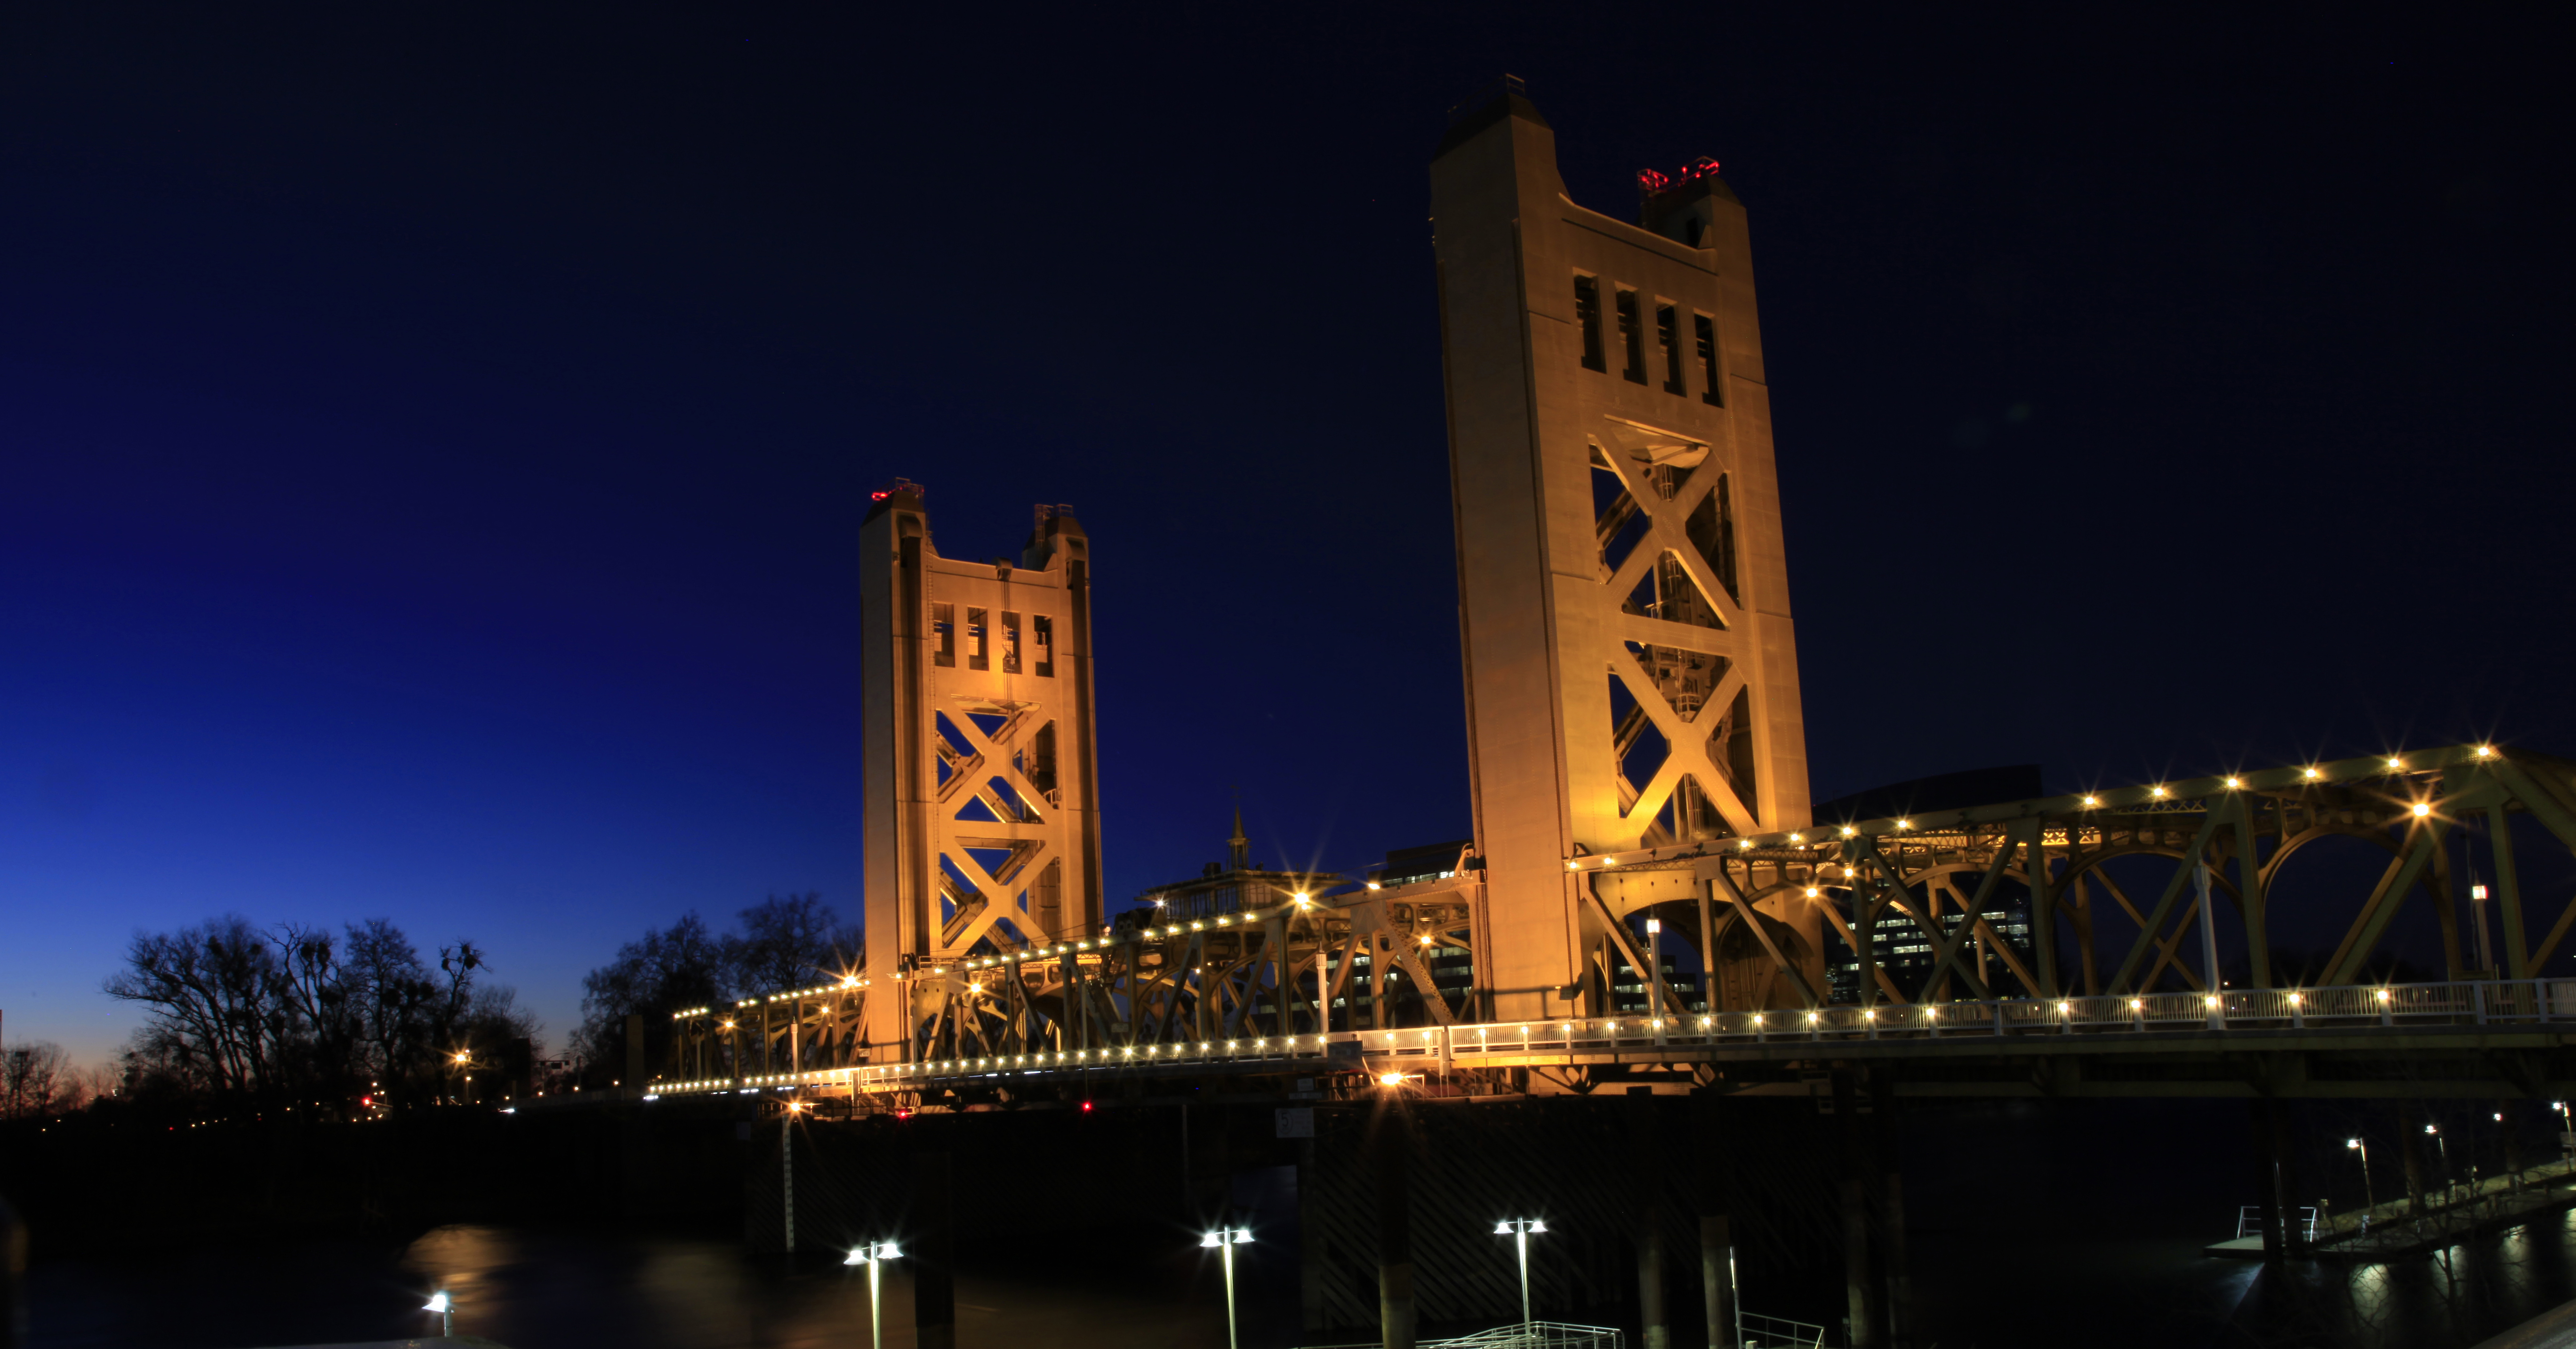 Tower Bridge Sacramento Images File:sacramento Tower Bridge